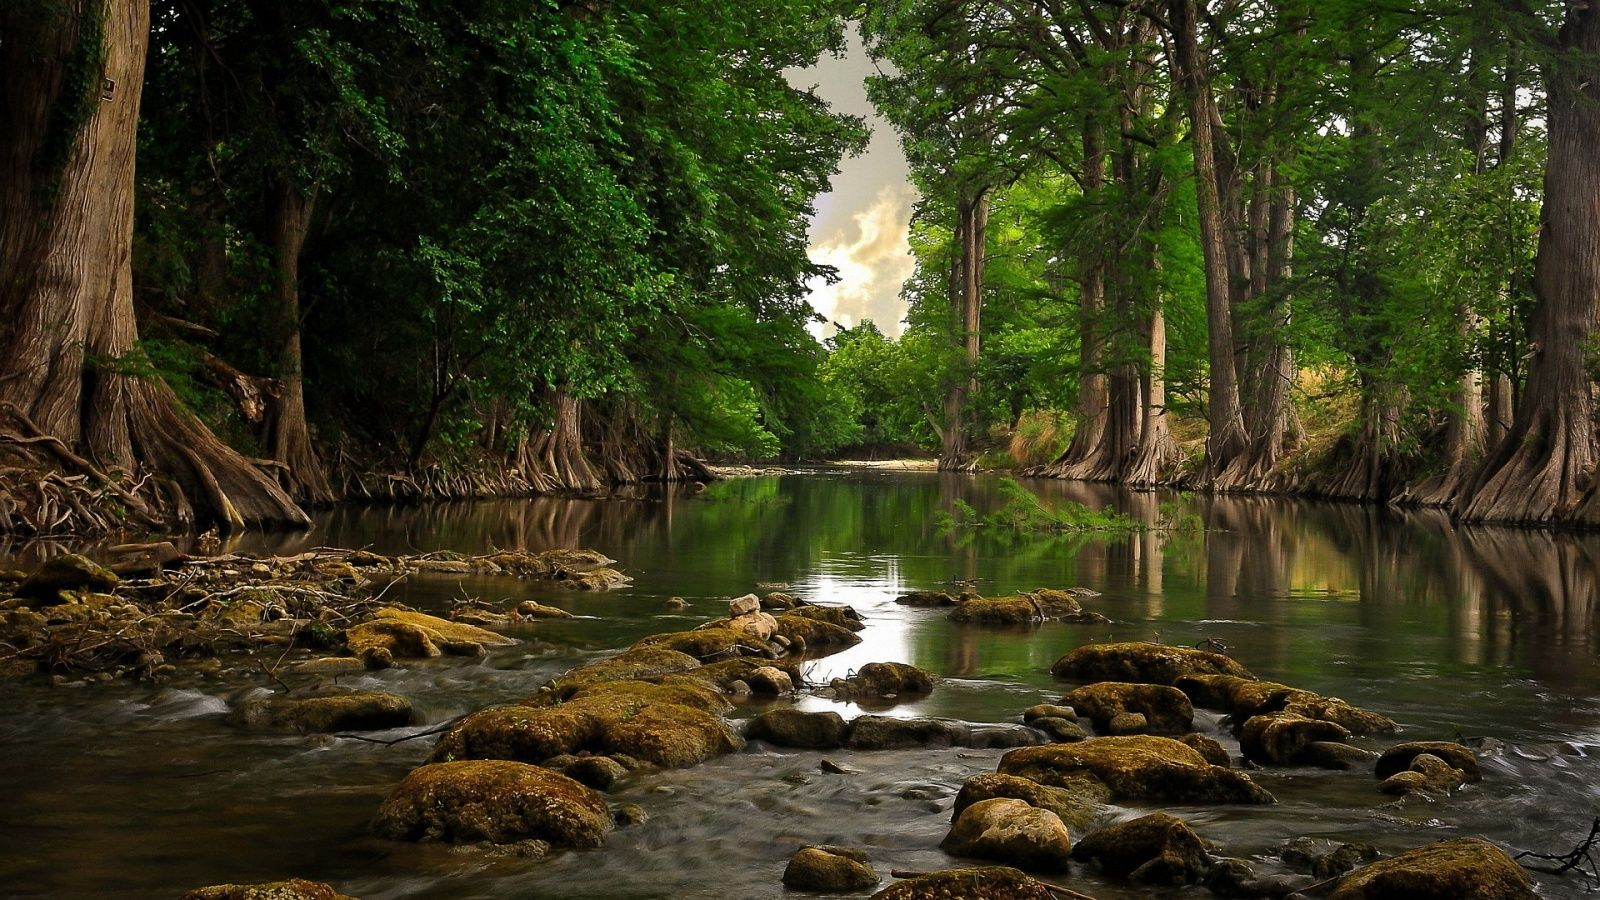 River 1600x900wallpaper Landscape Wallpaper Nature Wallpaper Background Images